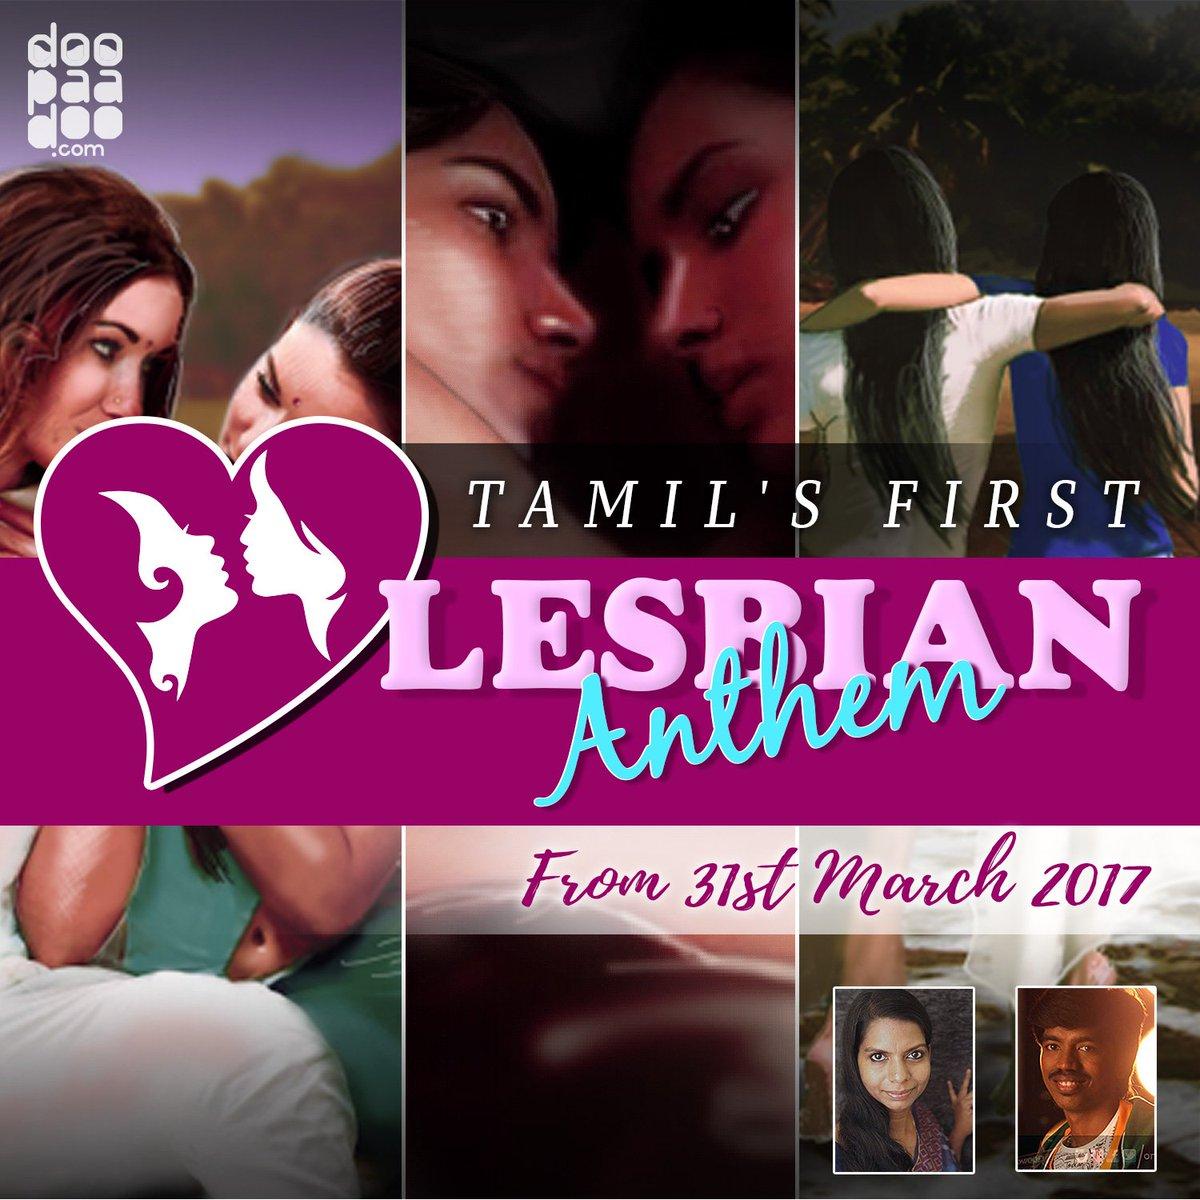 Lesbian anthem